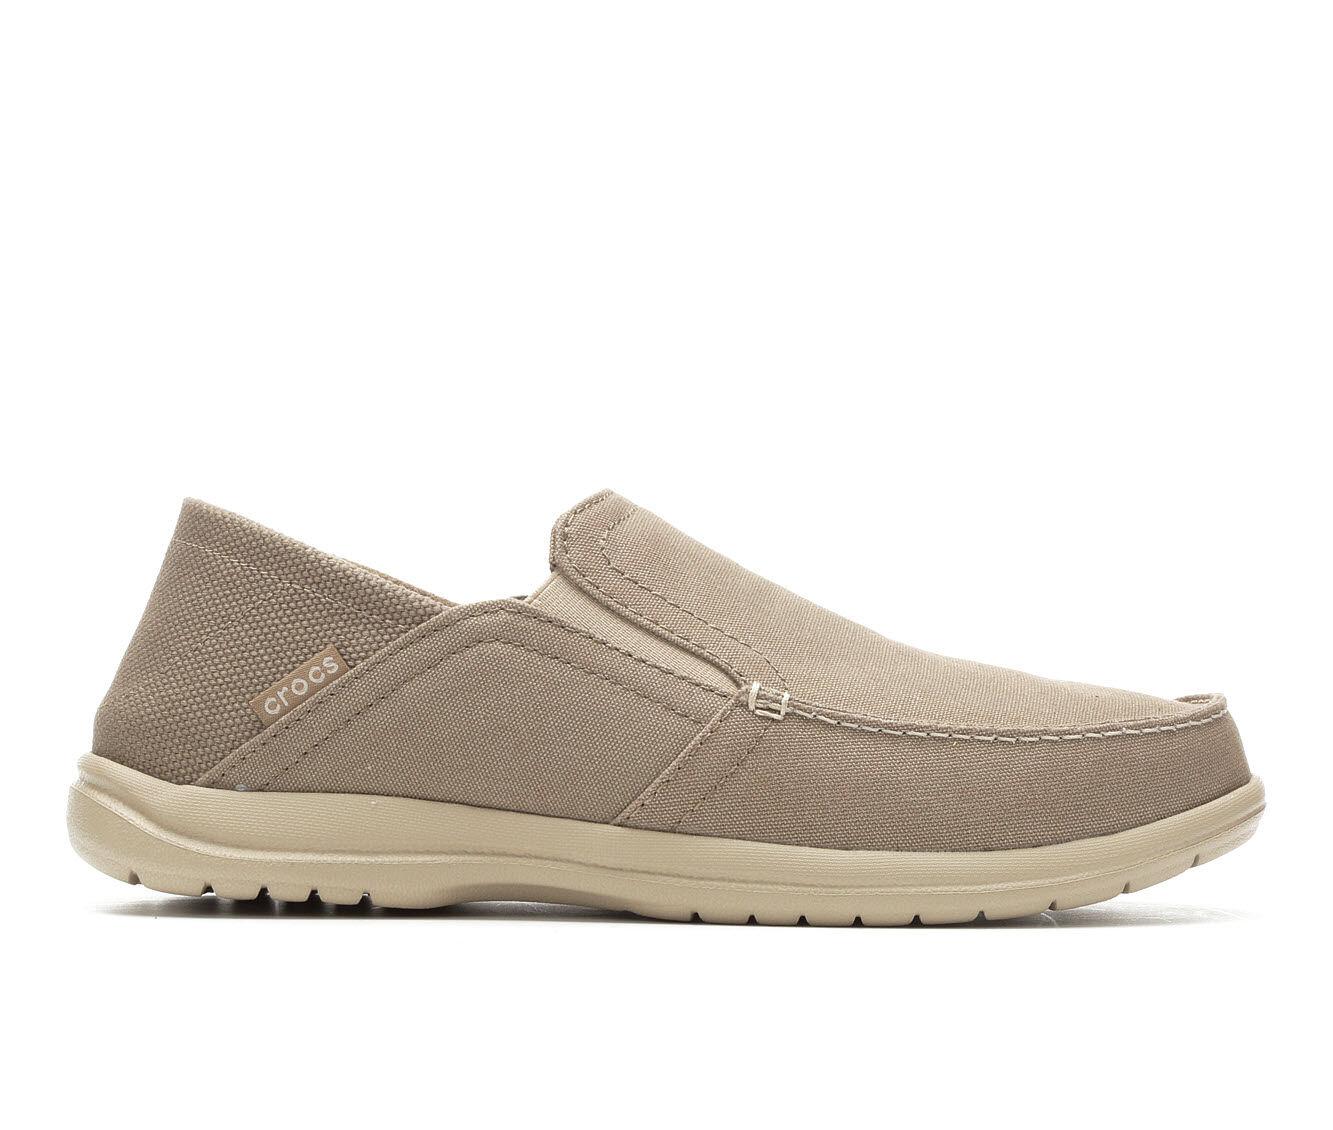 The Cheapest Selling Men's Crocs Santa Cruz Convertible Slip On Loafer Khaki/Cobble